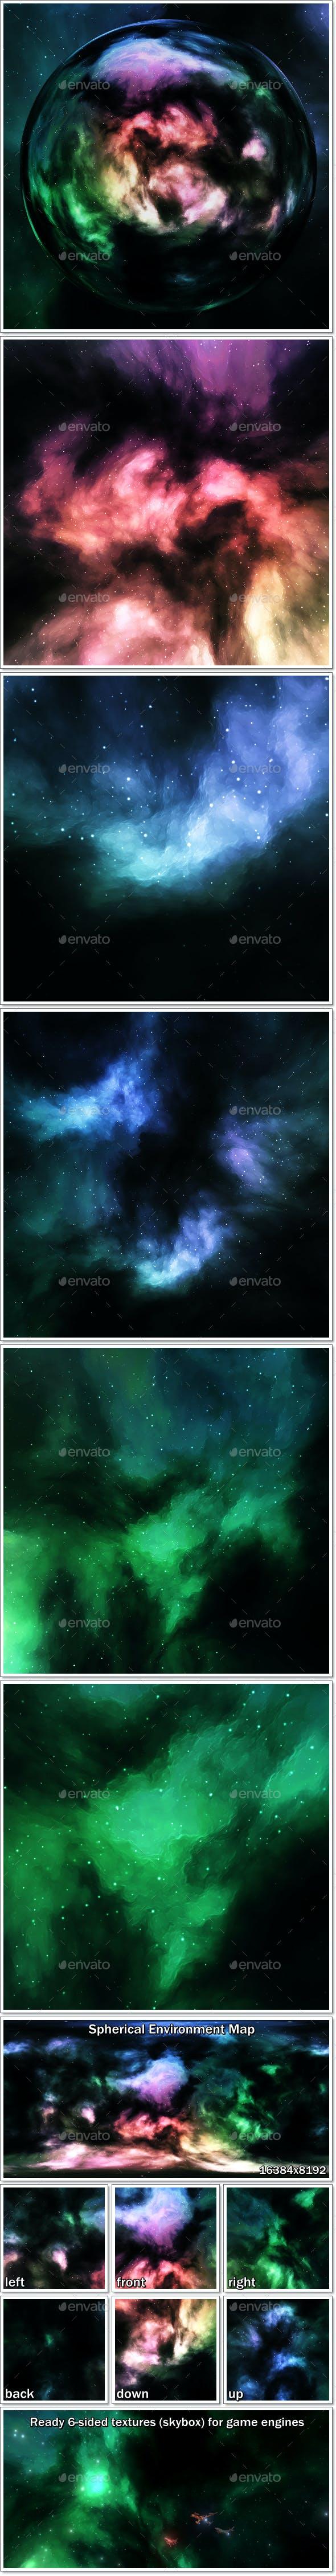 Nebula Space Environment HDRI Map 010 - 3DOcean Item for Sale